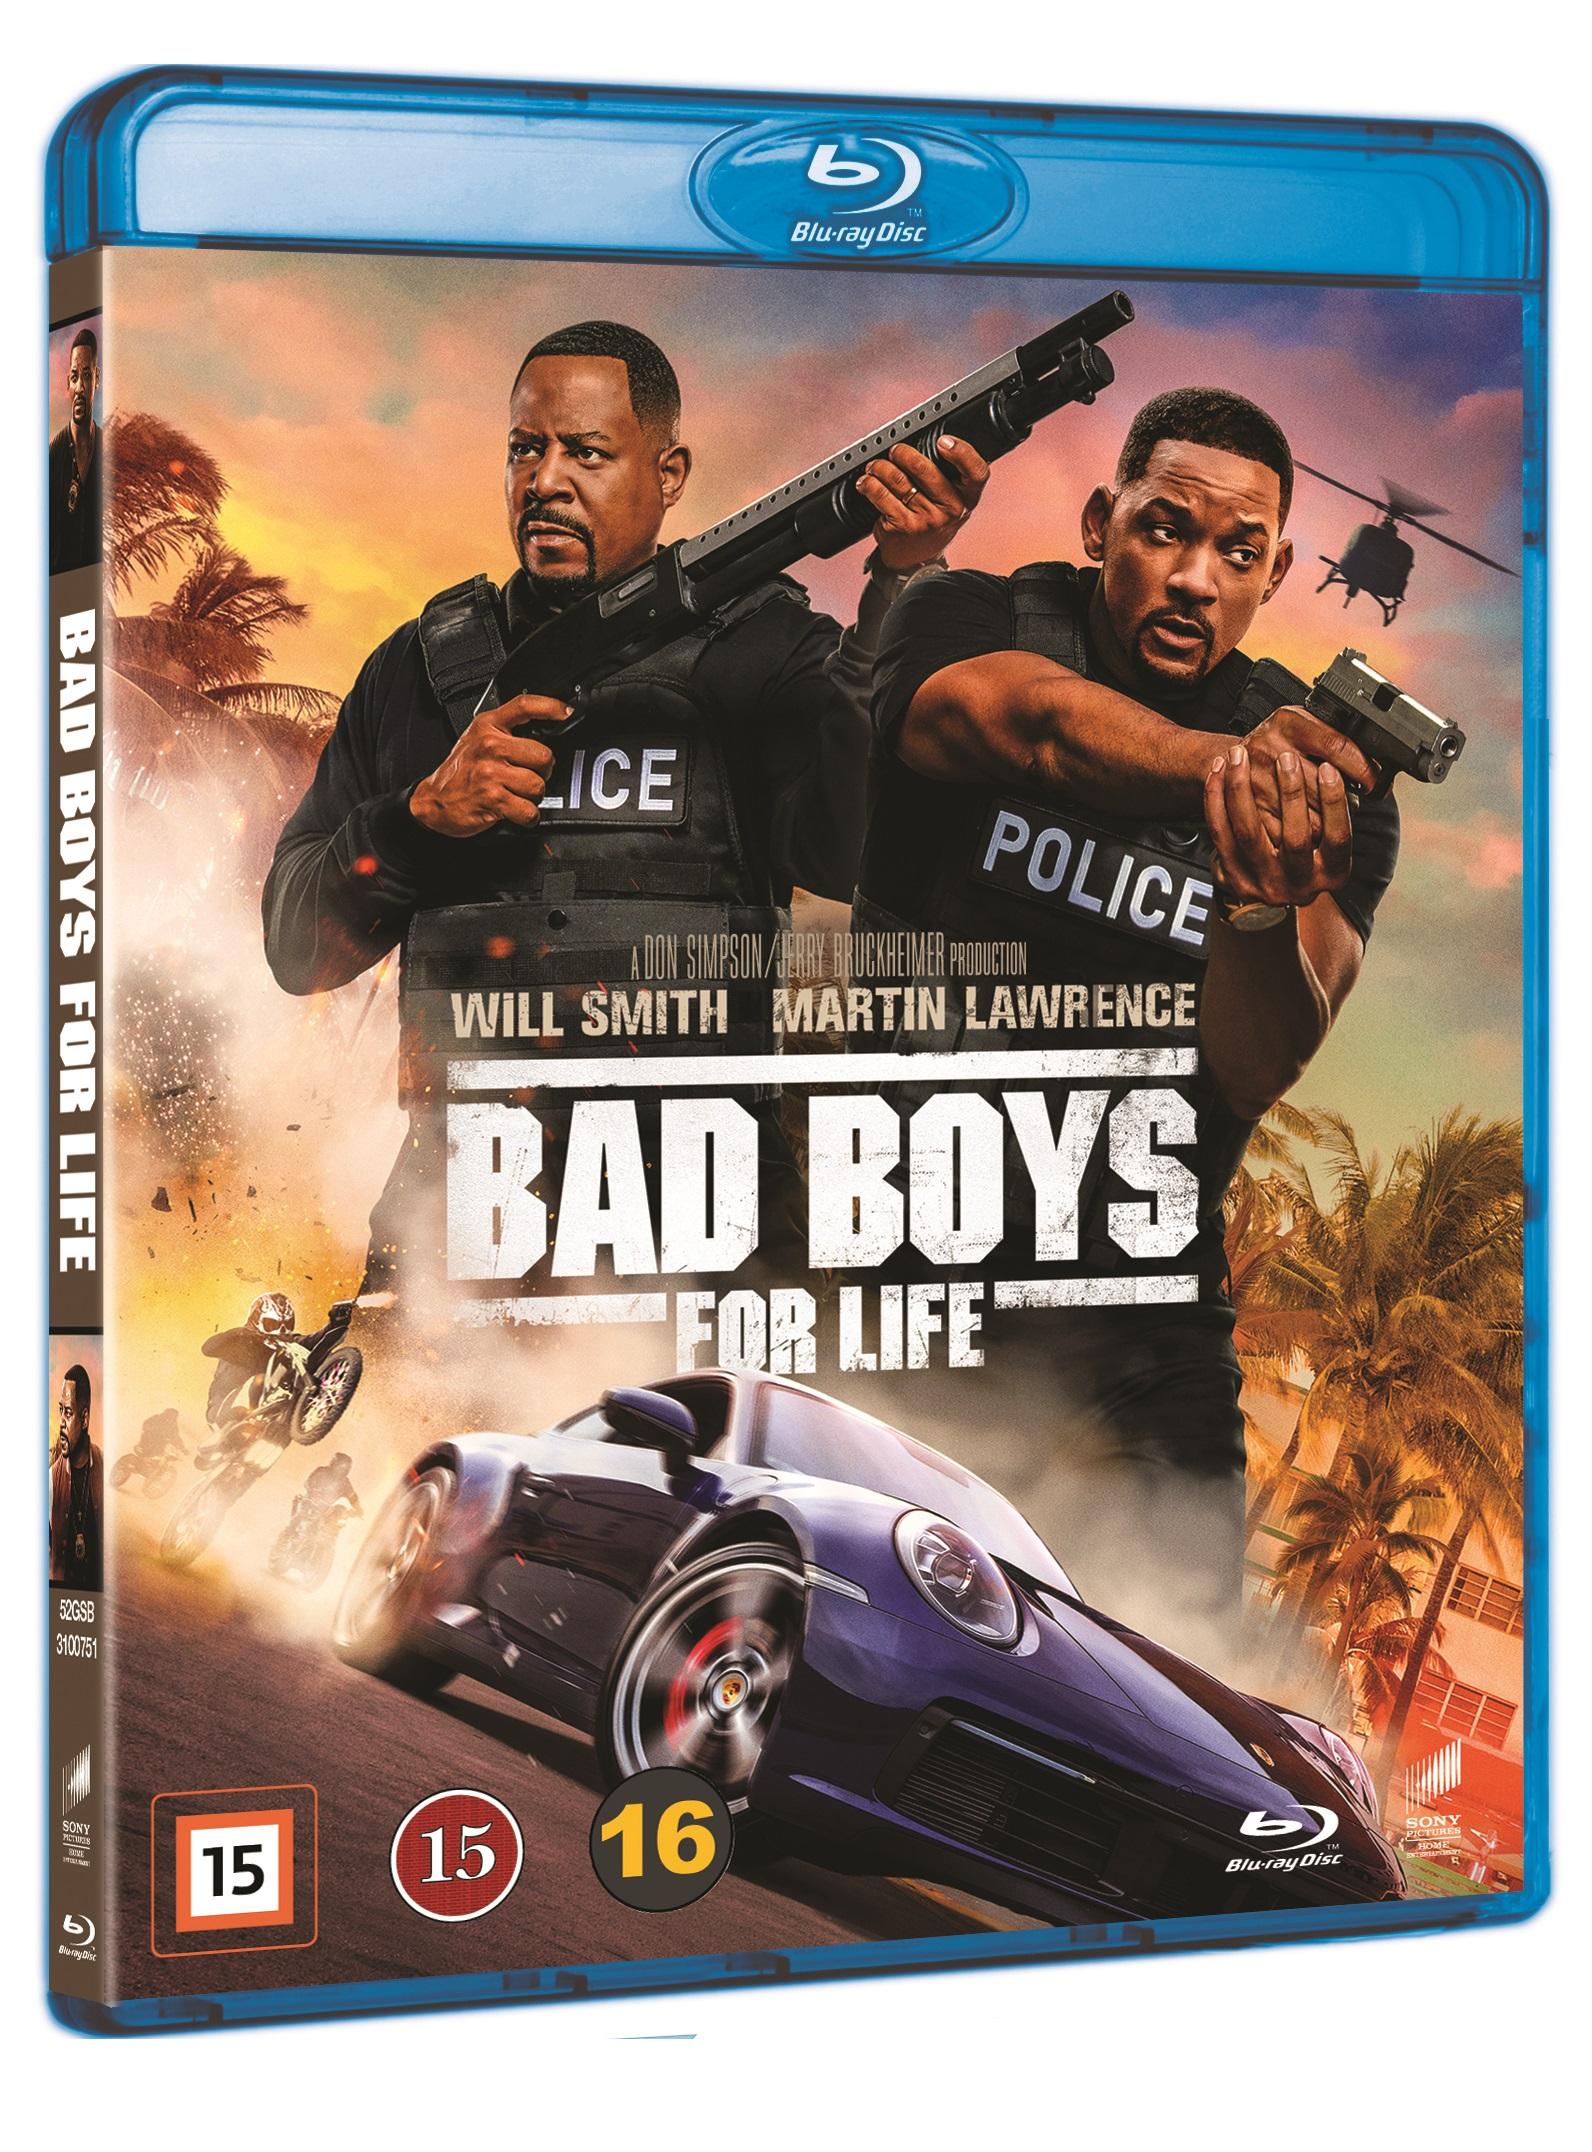 Bad Boys for Life (Bad Boys 3) -  - Film -  - 7330031007512 - 1/6-2020